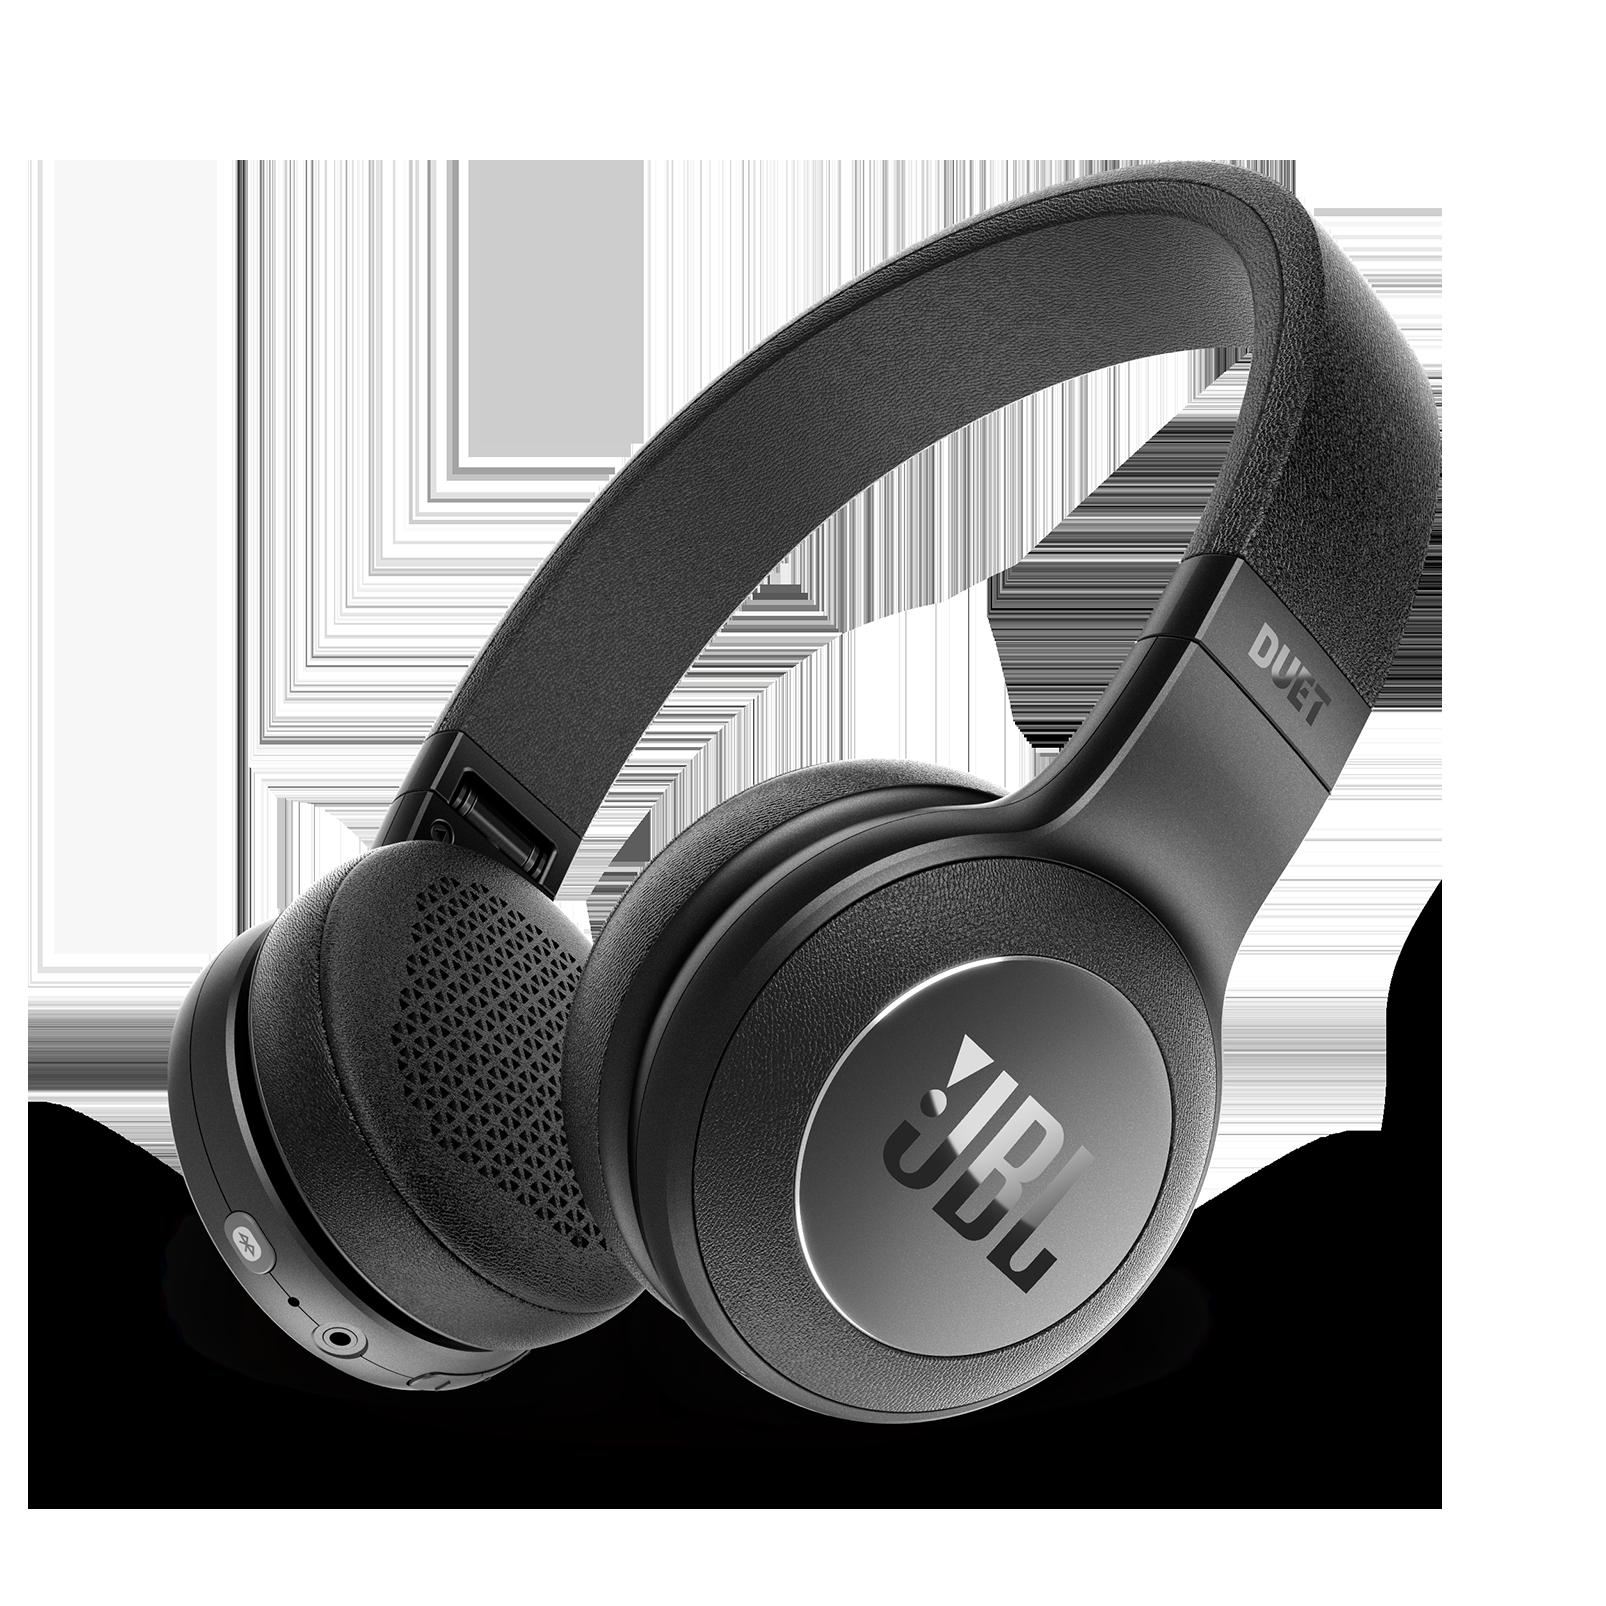 jbl duet bt wireless on ear headphones. Black Bedroom Furniture Sets. Home Design Ideas